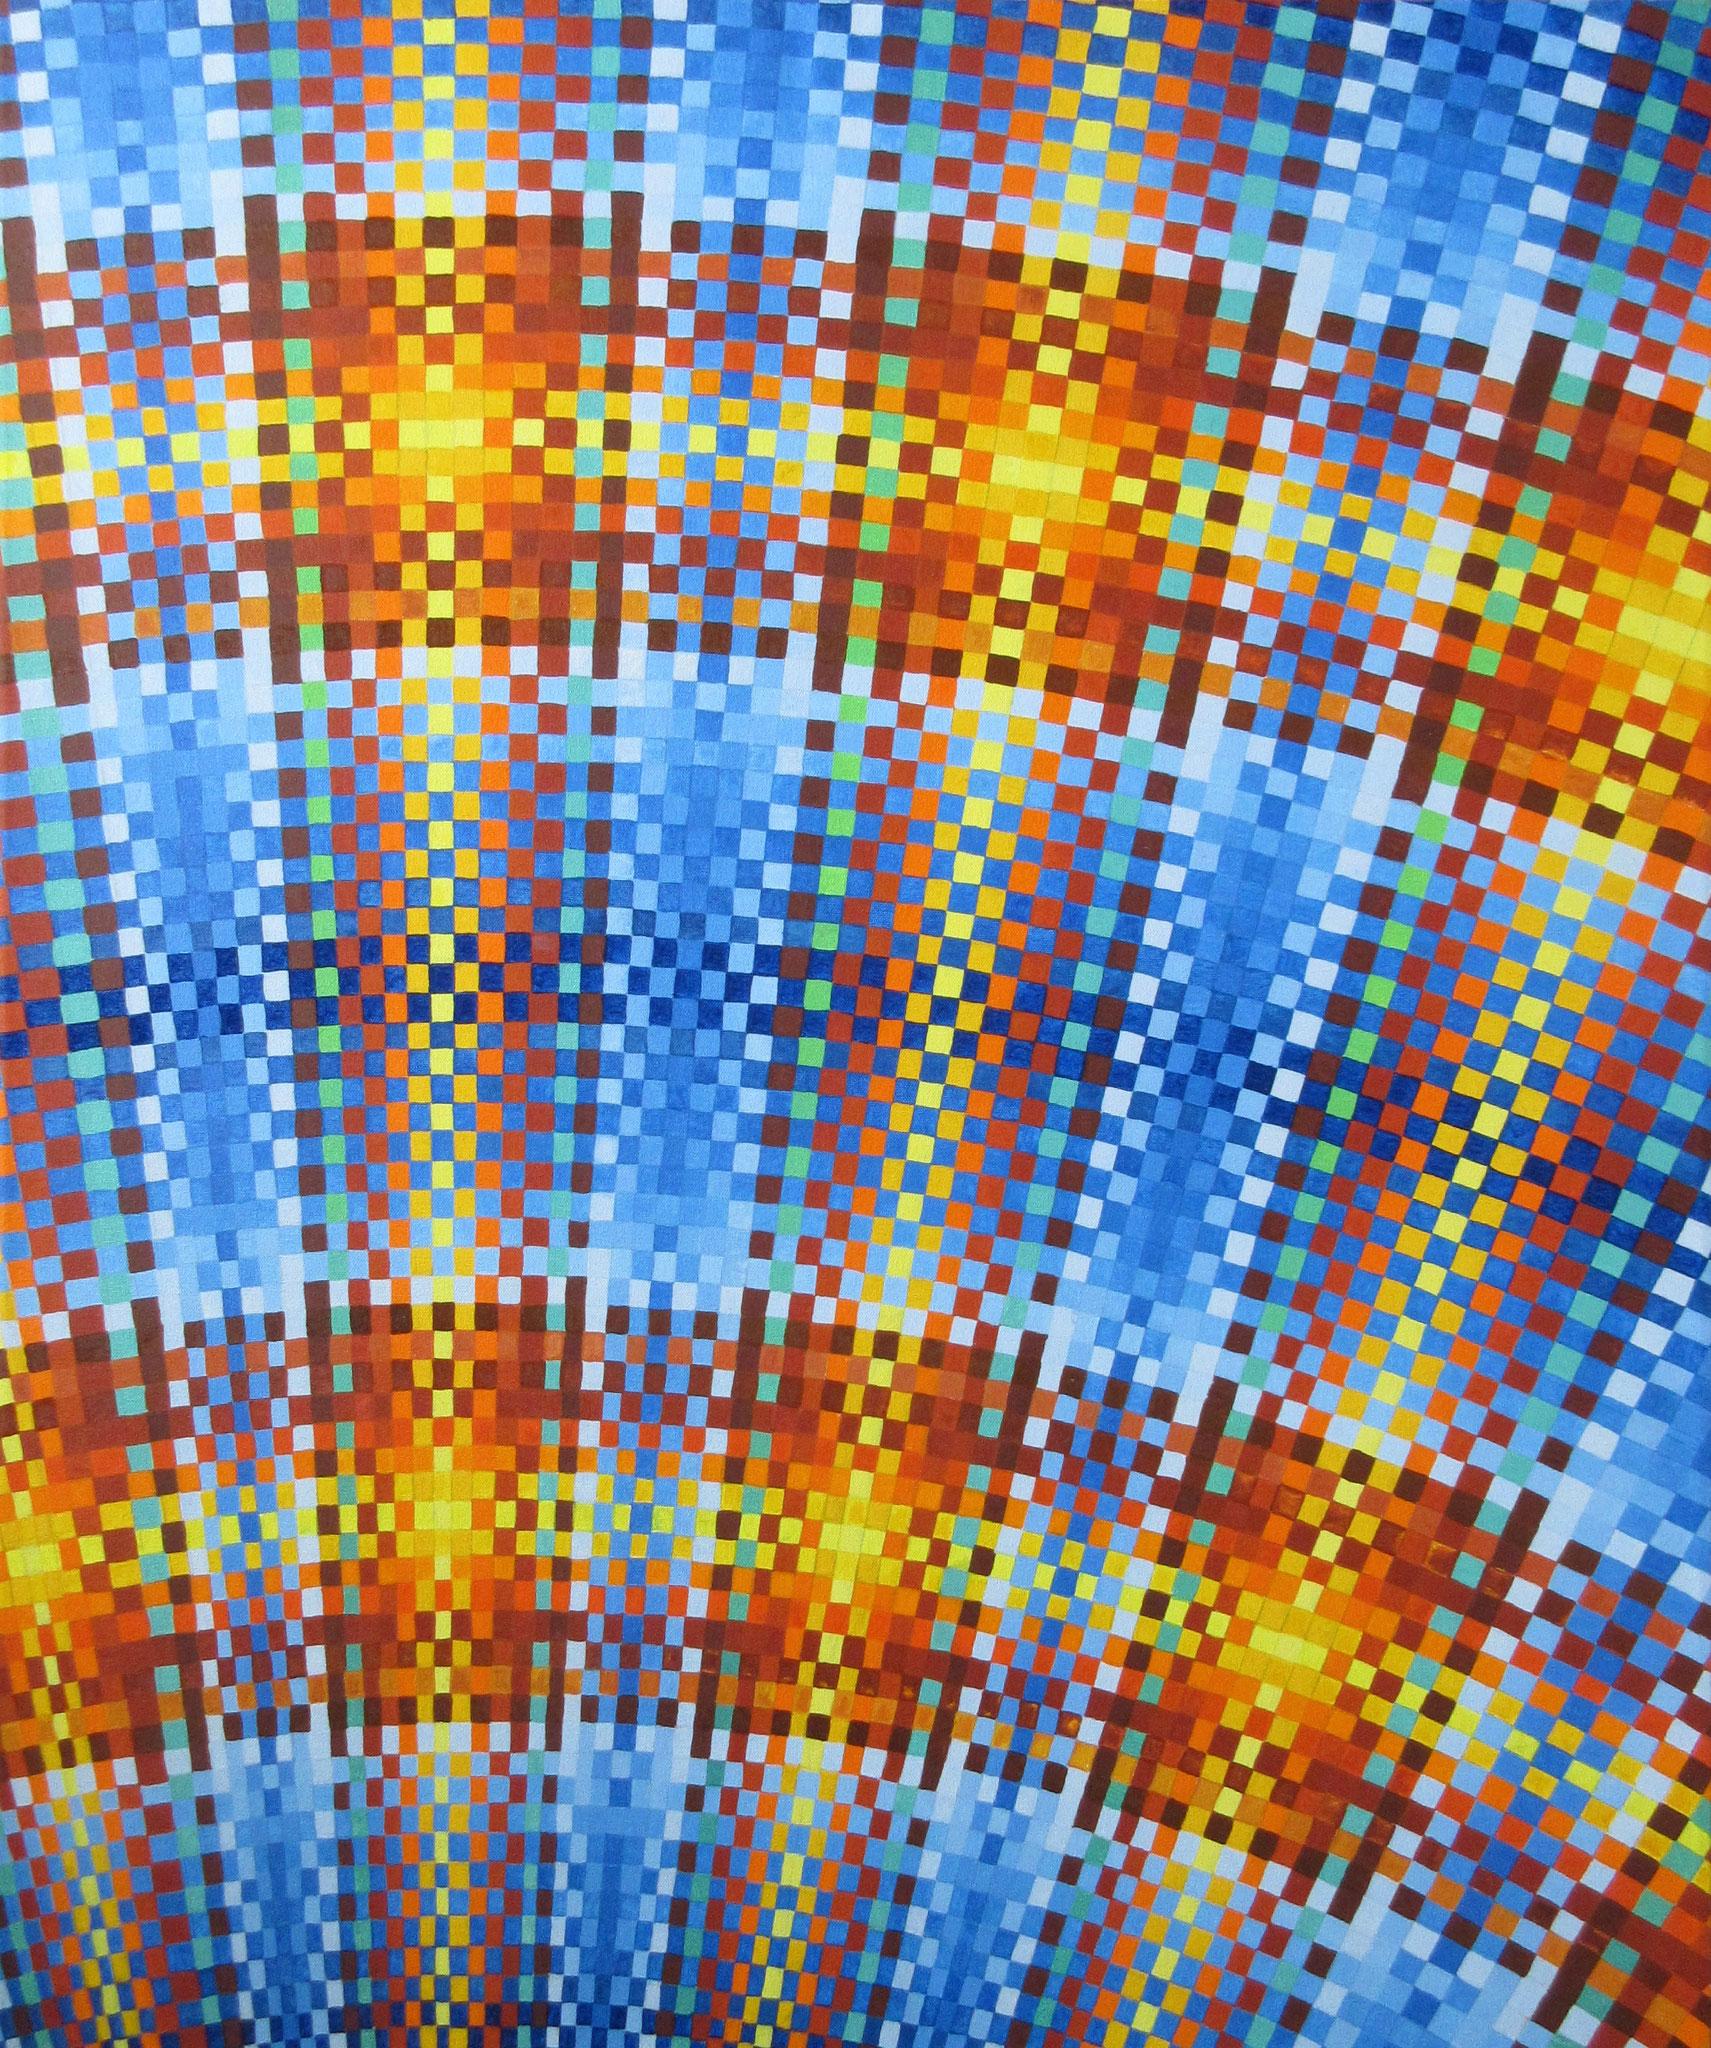 """Fabric of Life III"", oil on canvas 30x36, Feb.2018"